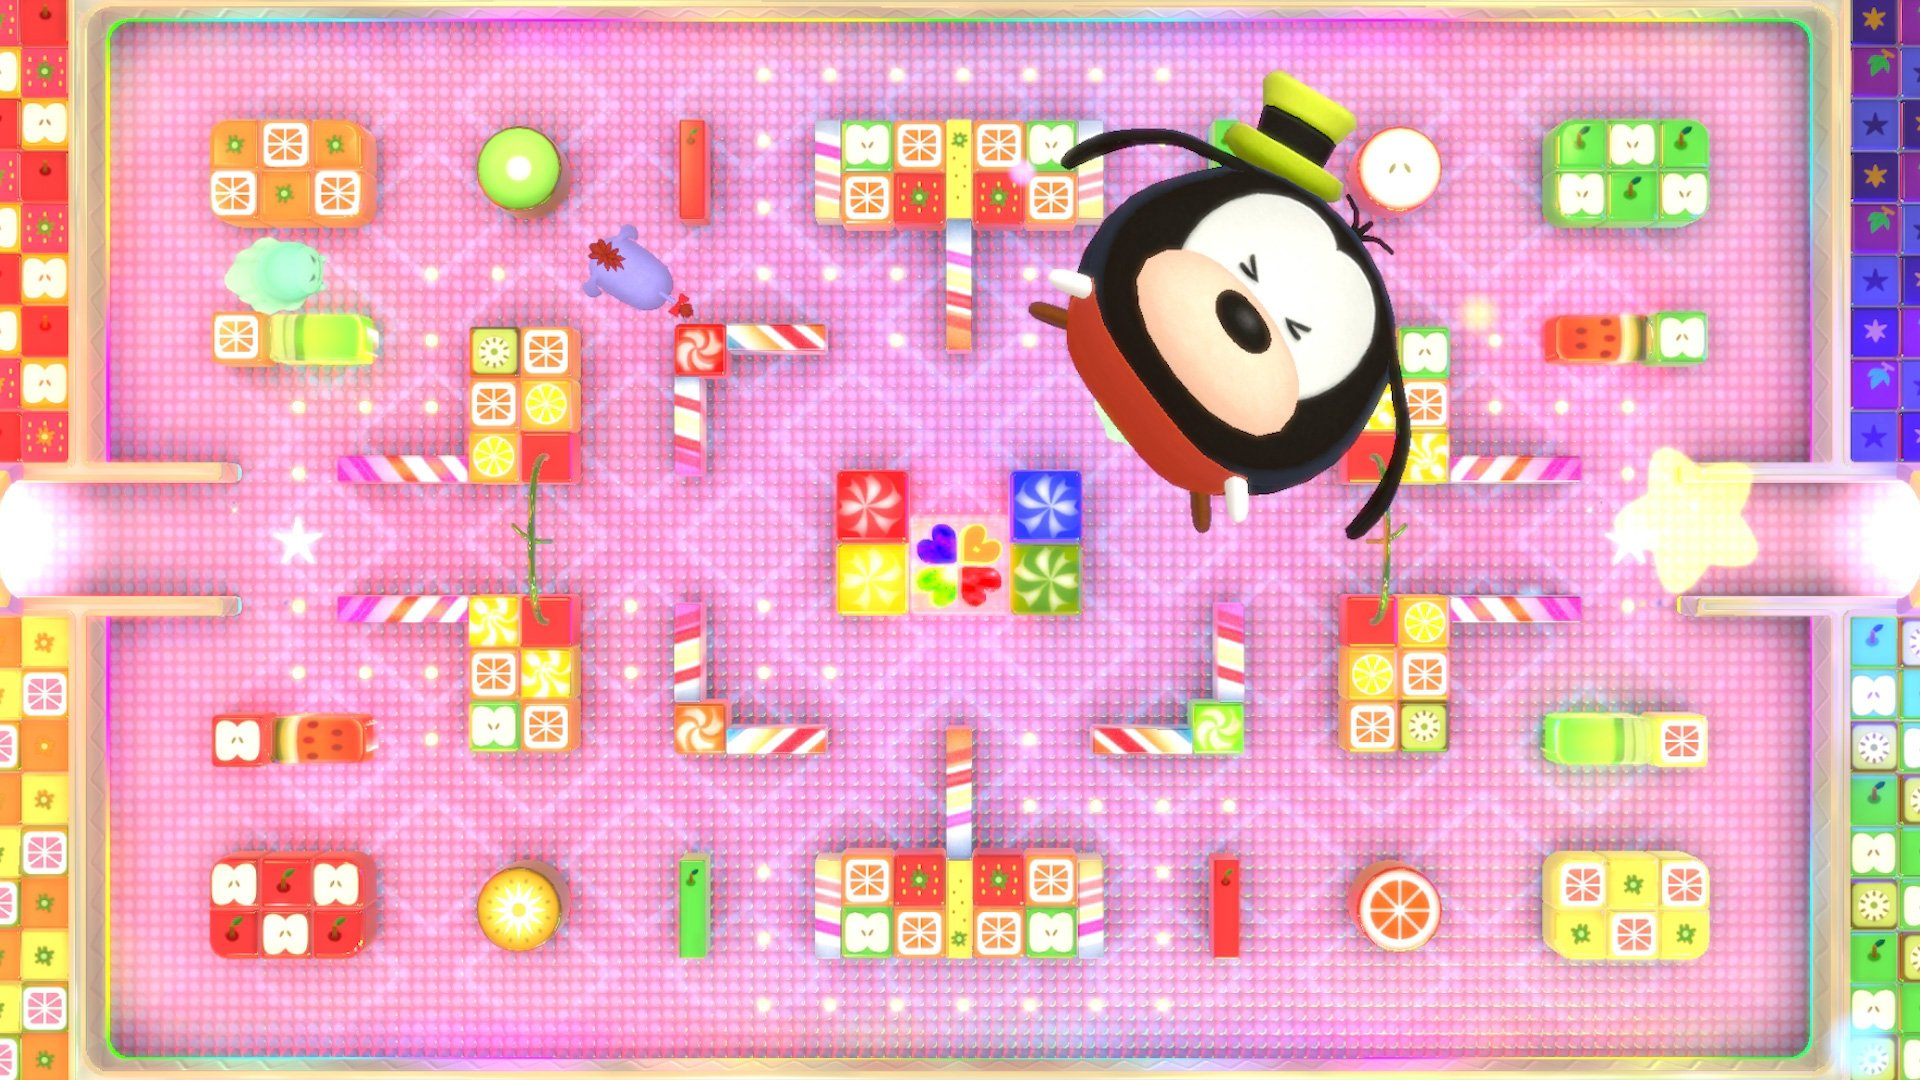 Disney Tsum Tsum Festival is sure to be a parent's worst nightmare screenshot